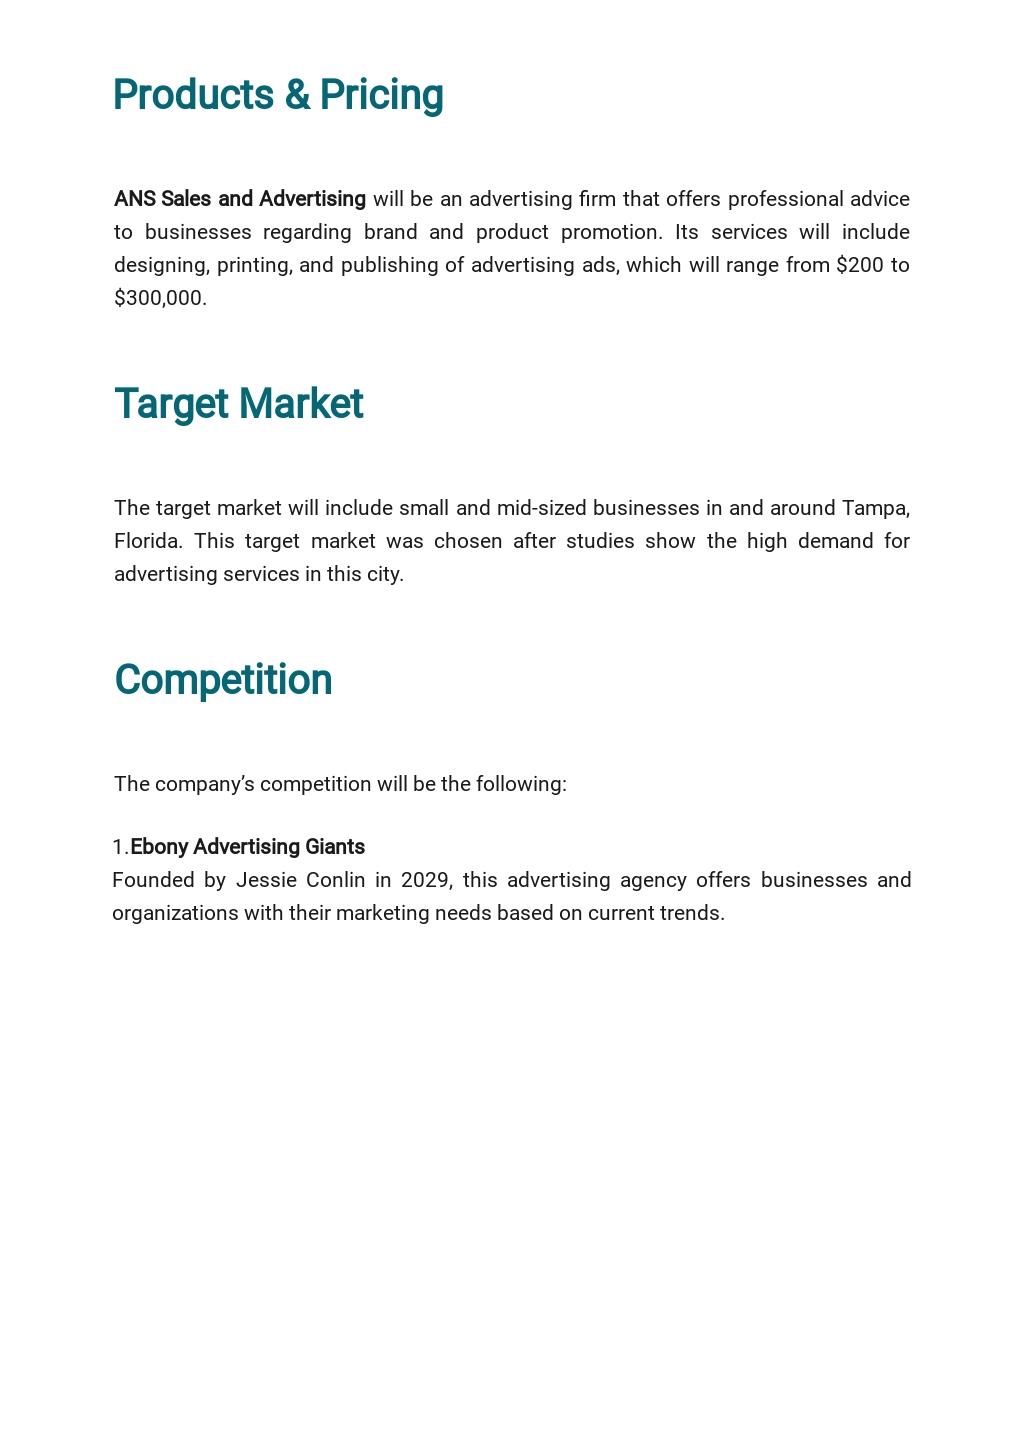 Advertising Agency Business Plan Template 2.jpe